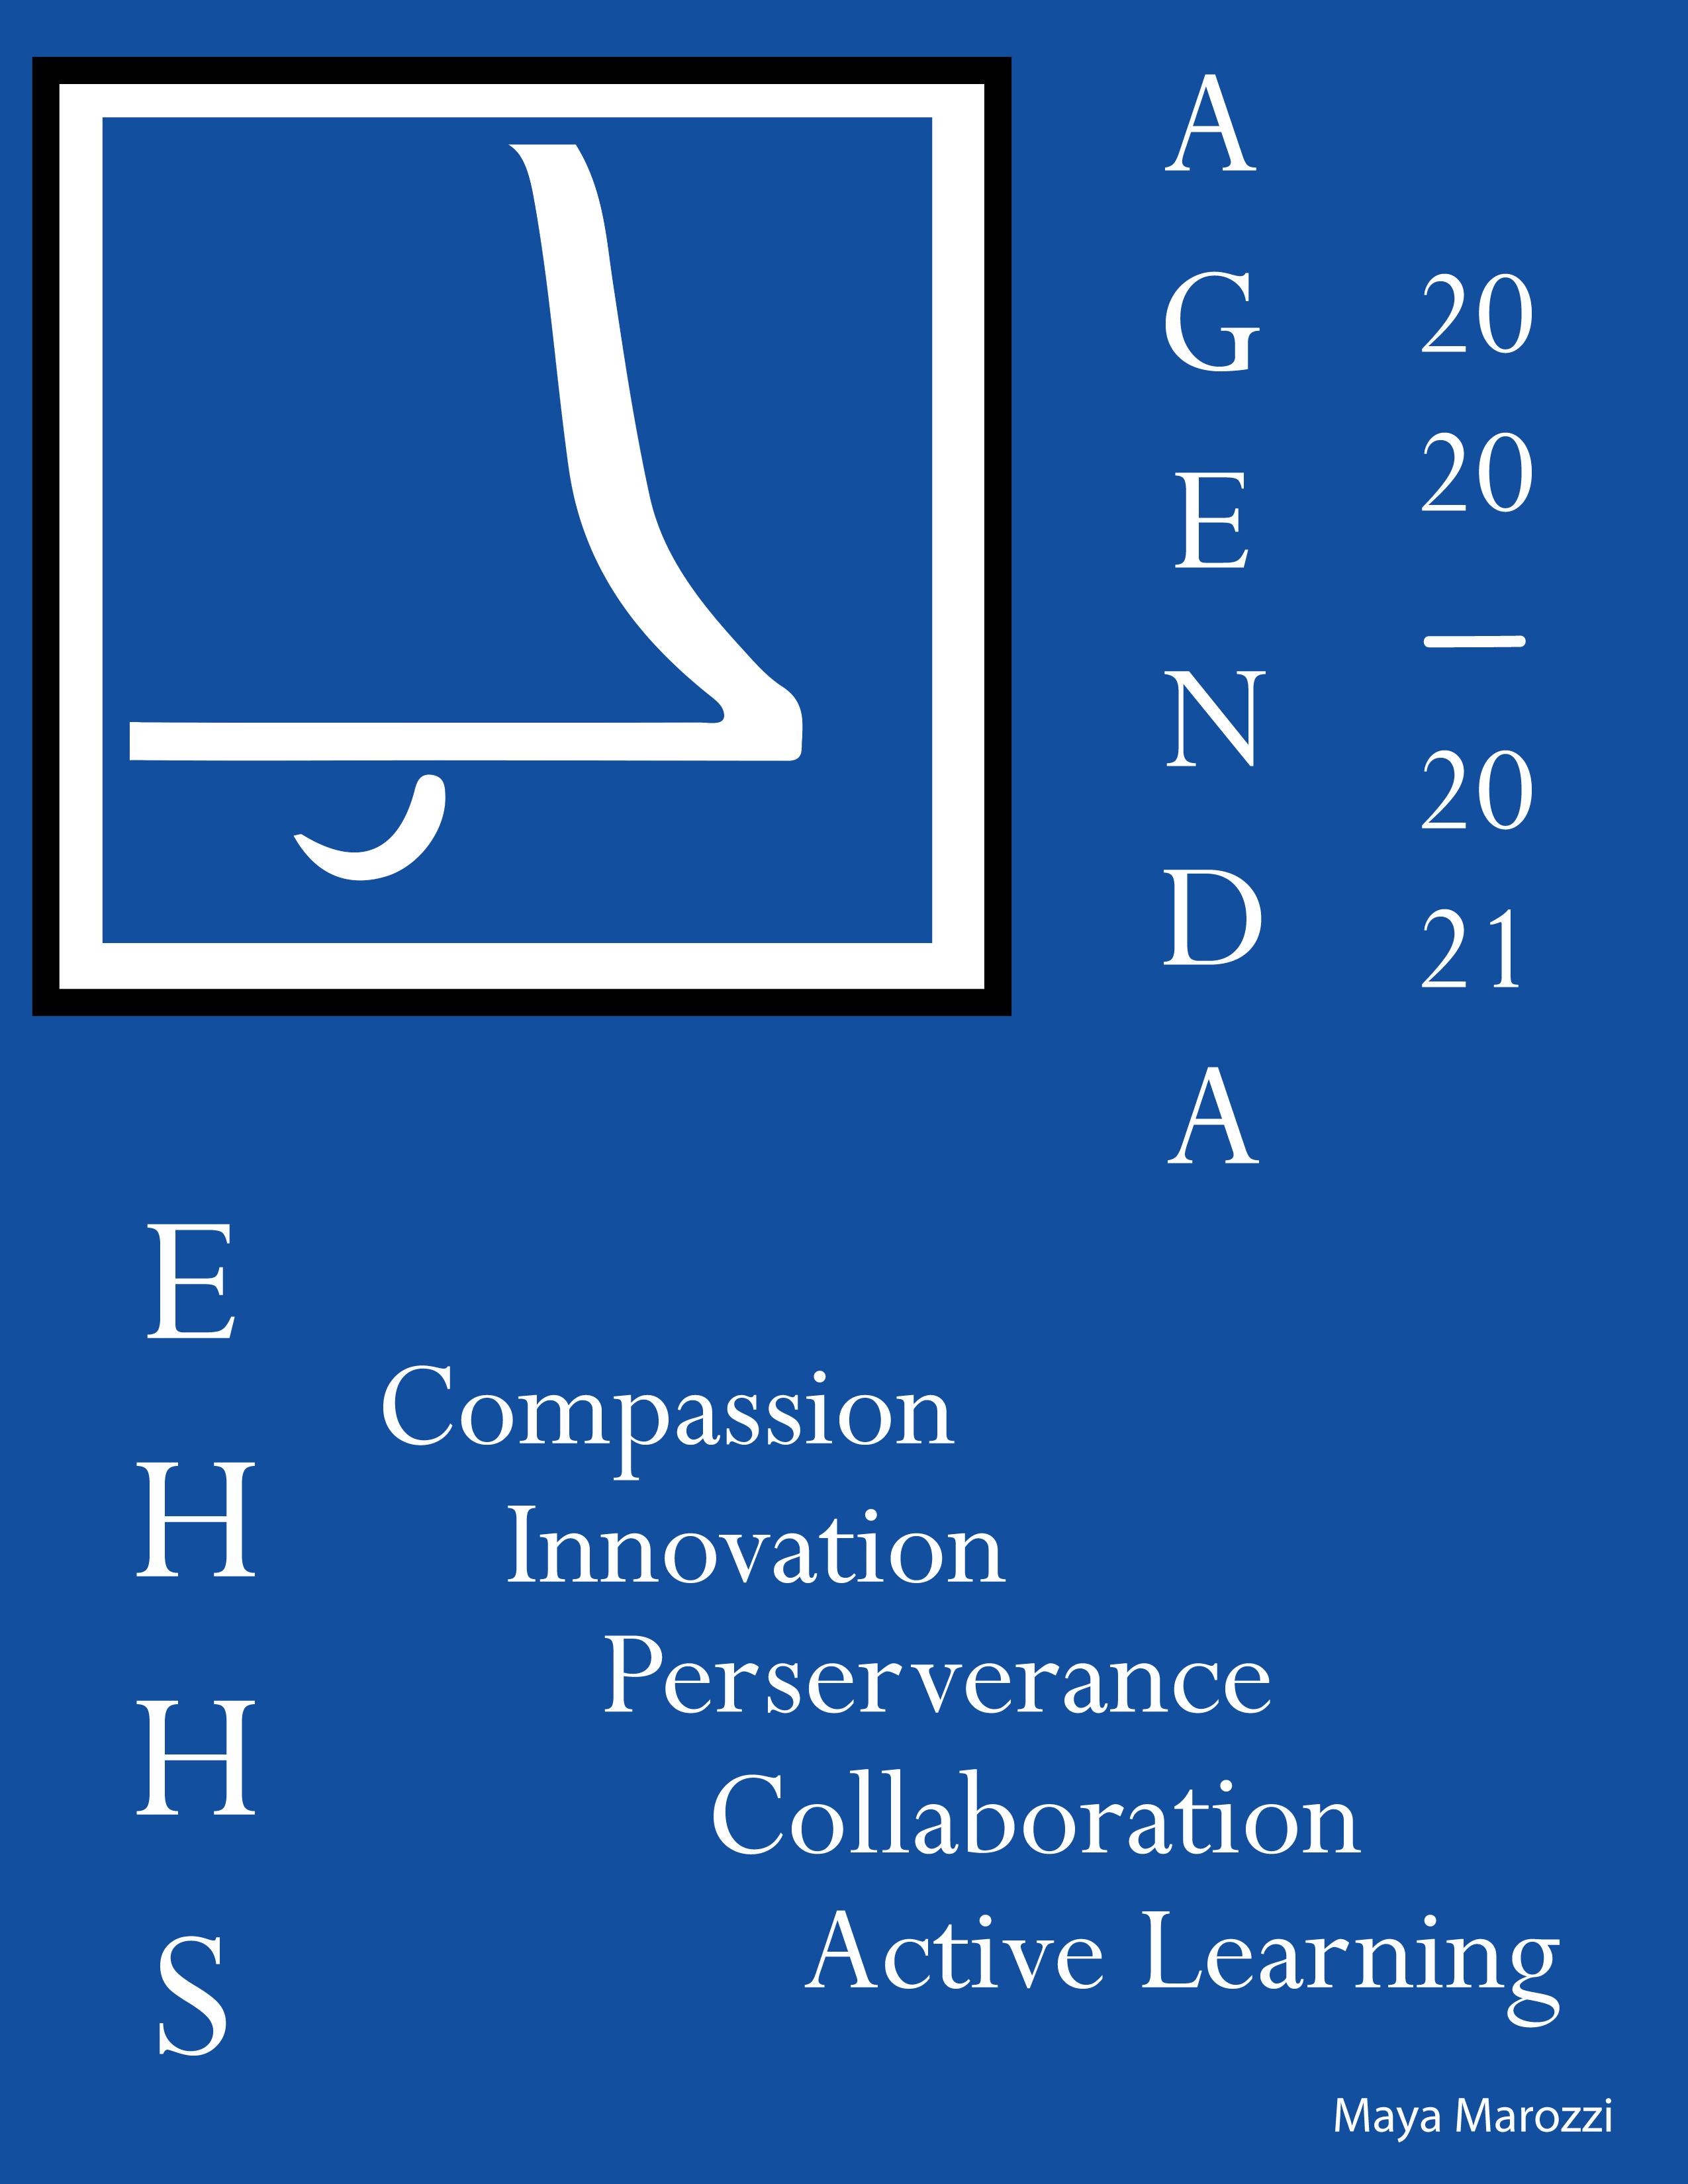 East Hampton High School Agenda Cover 2020-21